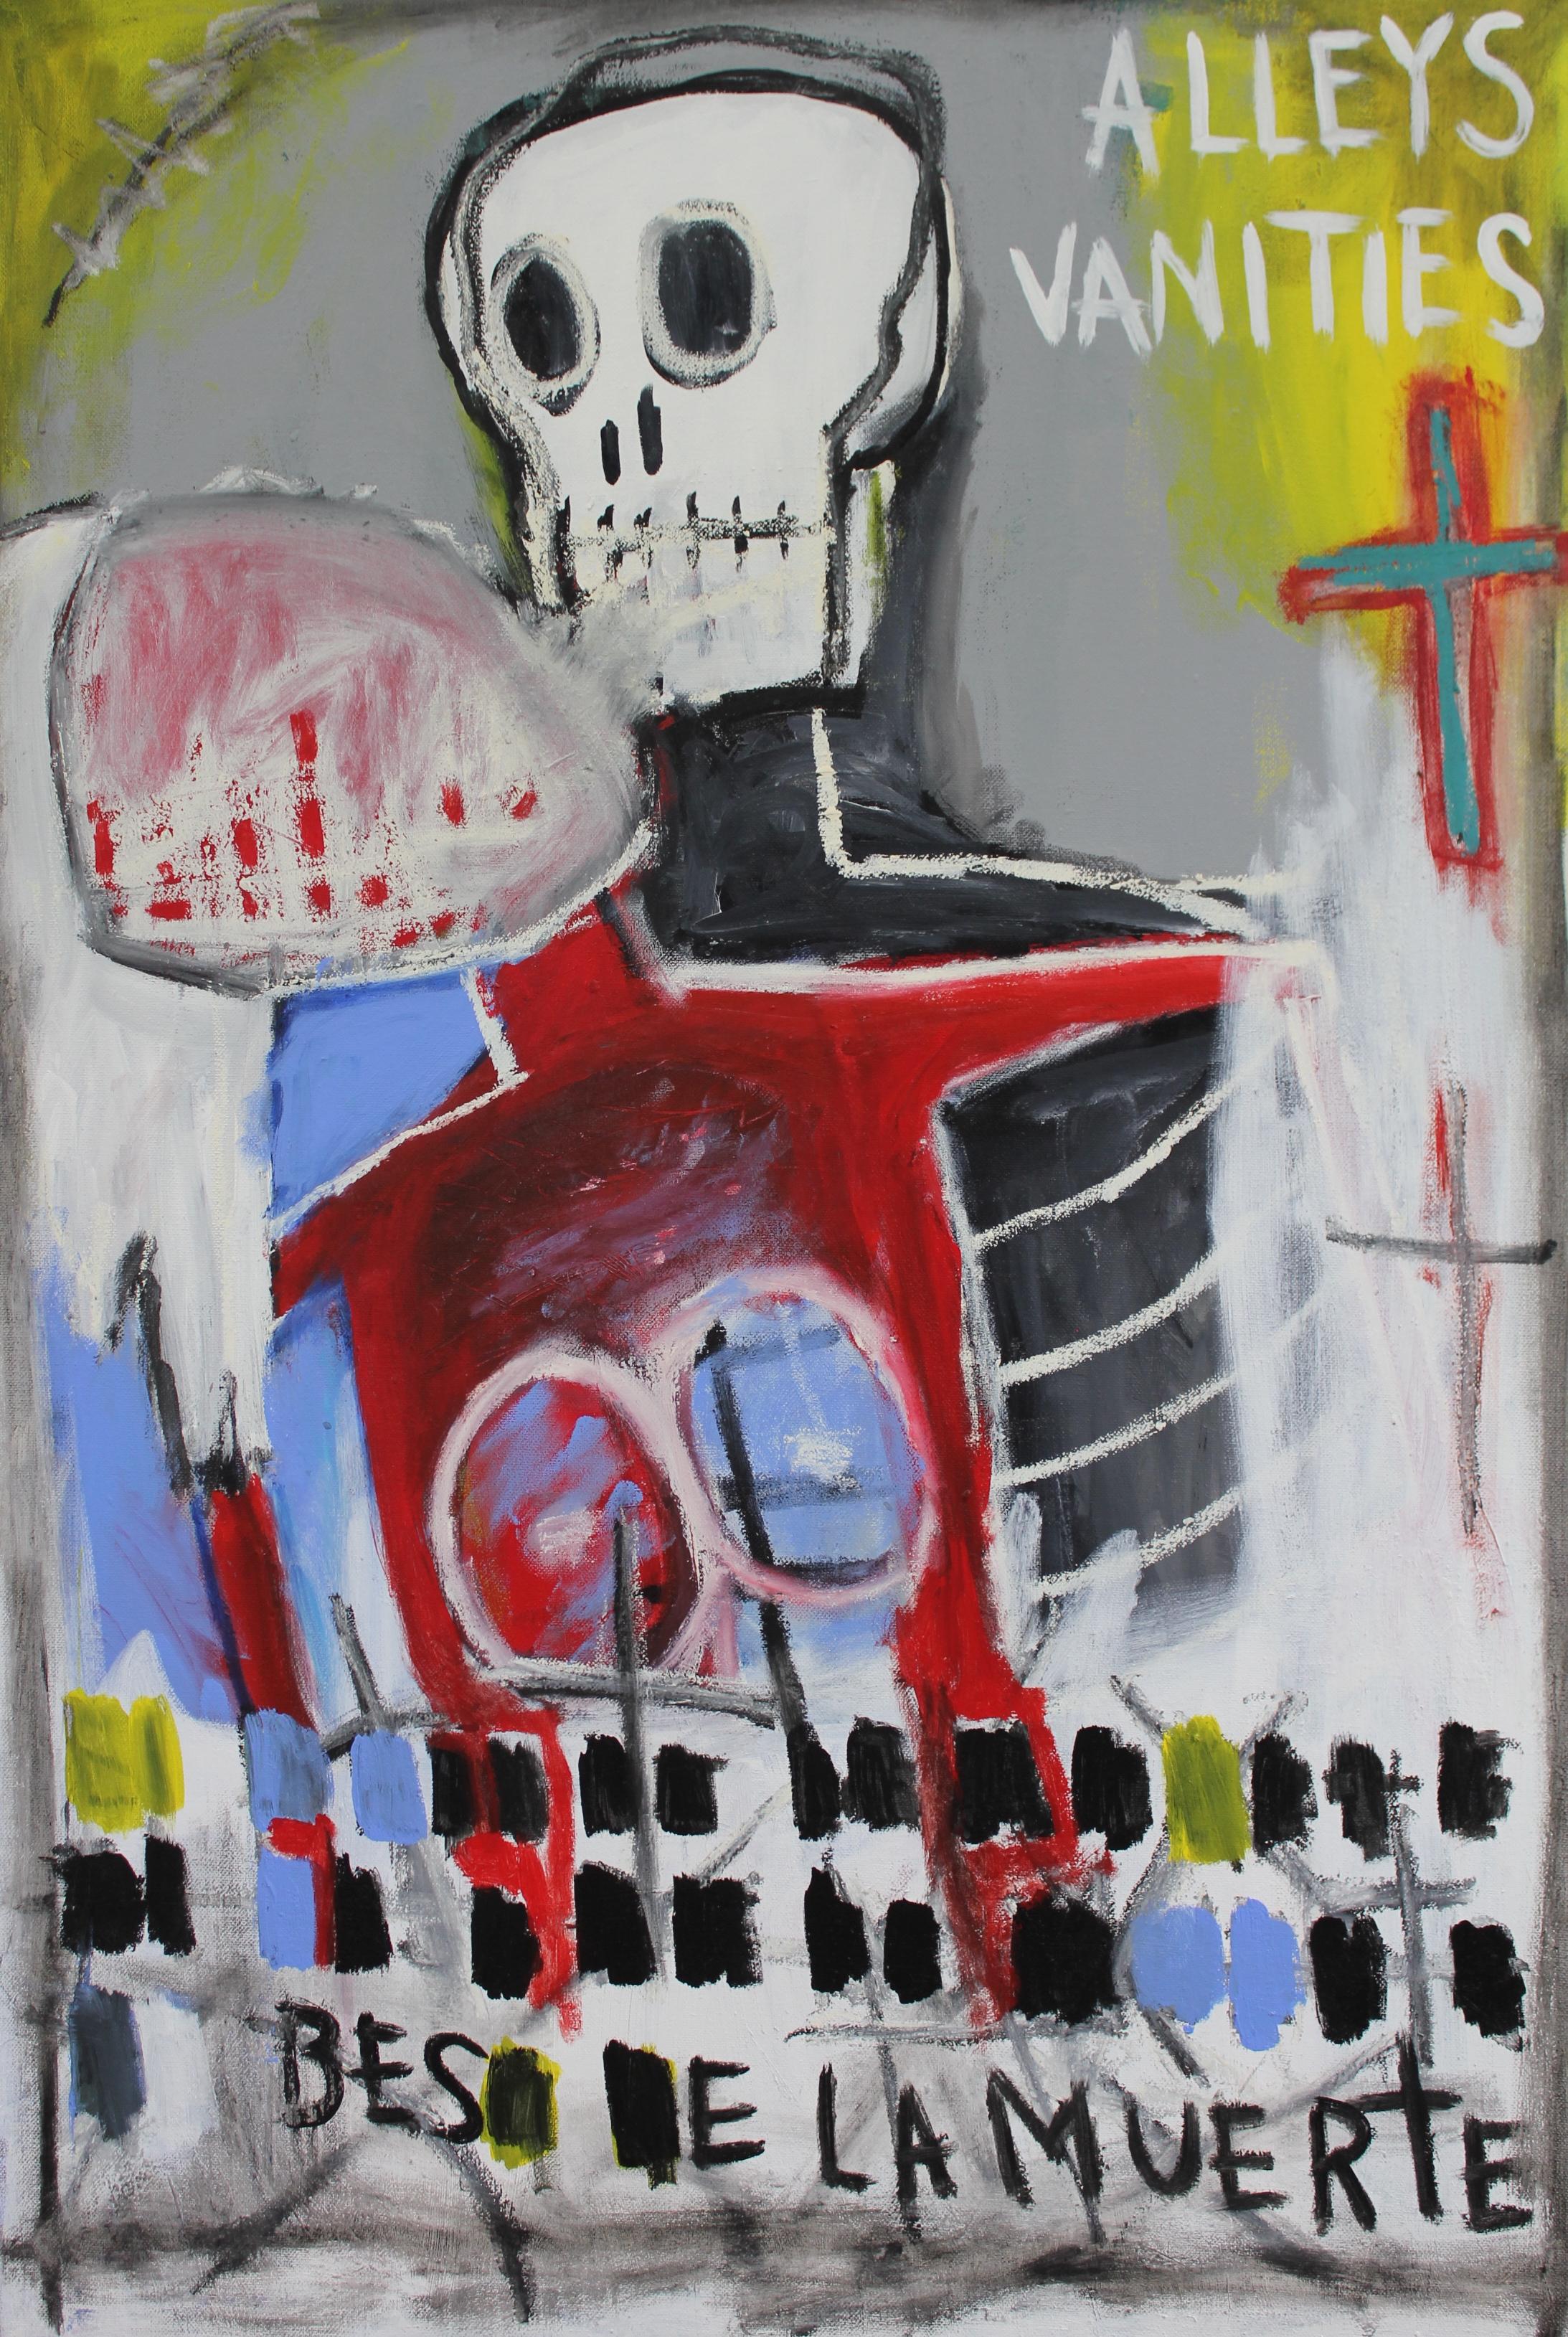 Untitled (Alleys and Vanities) 2011